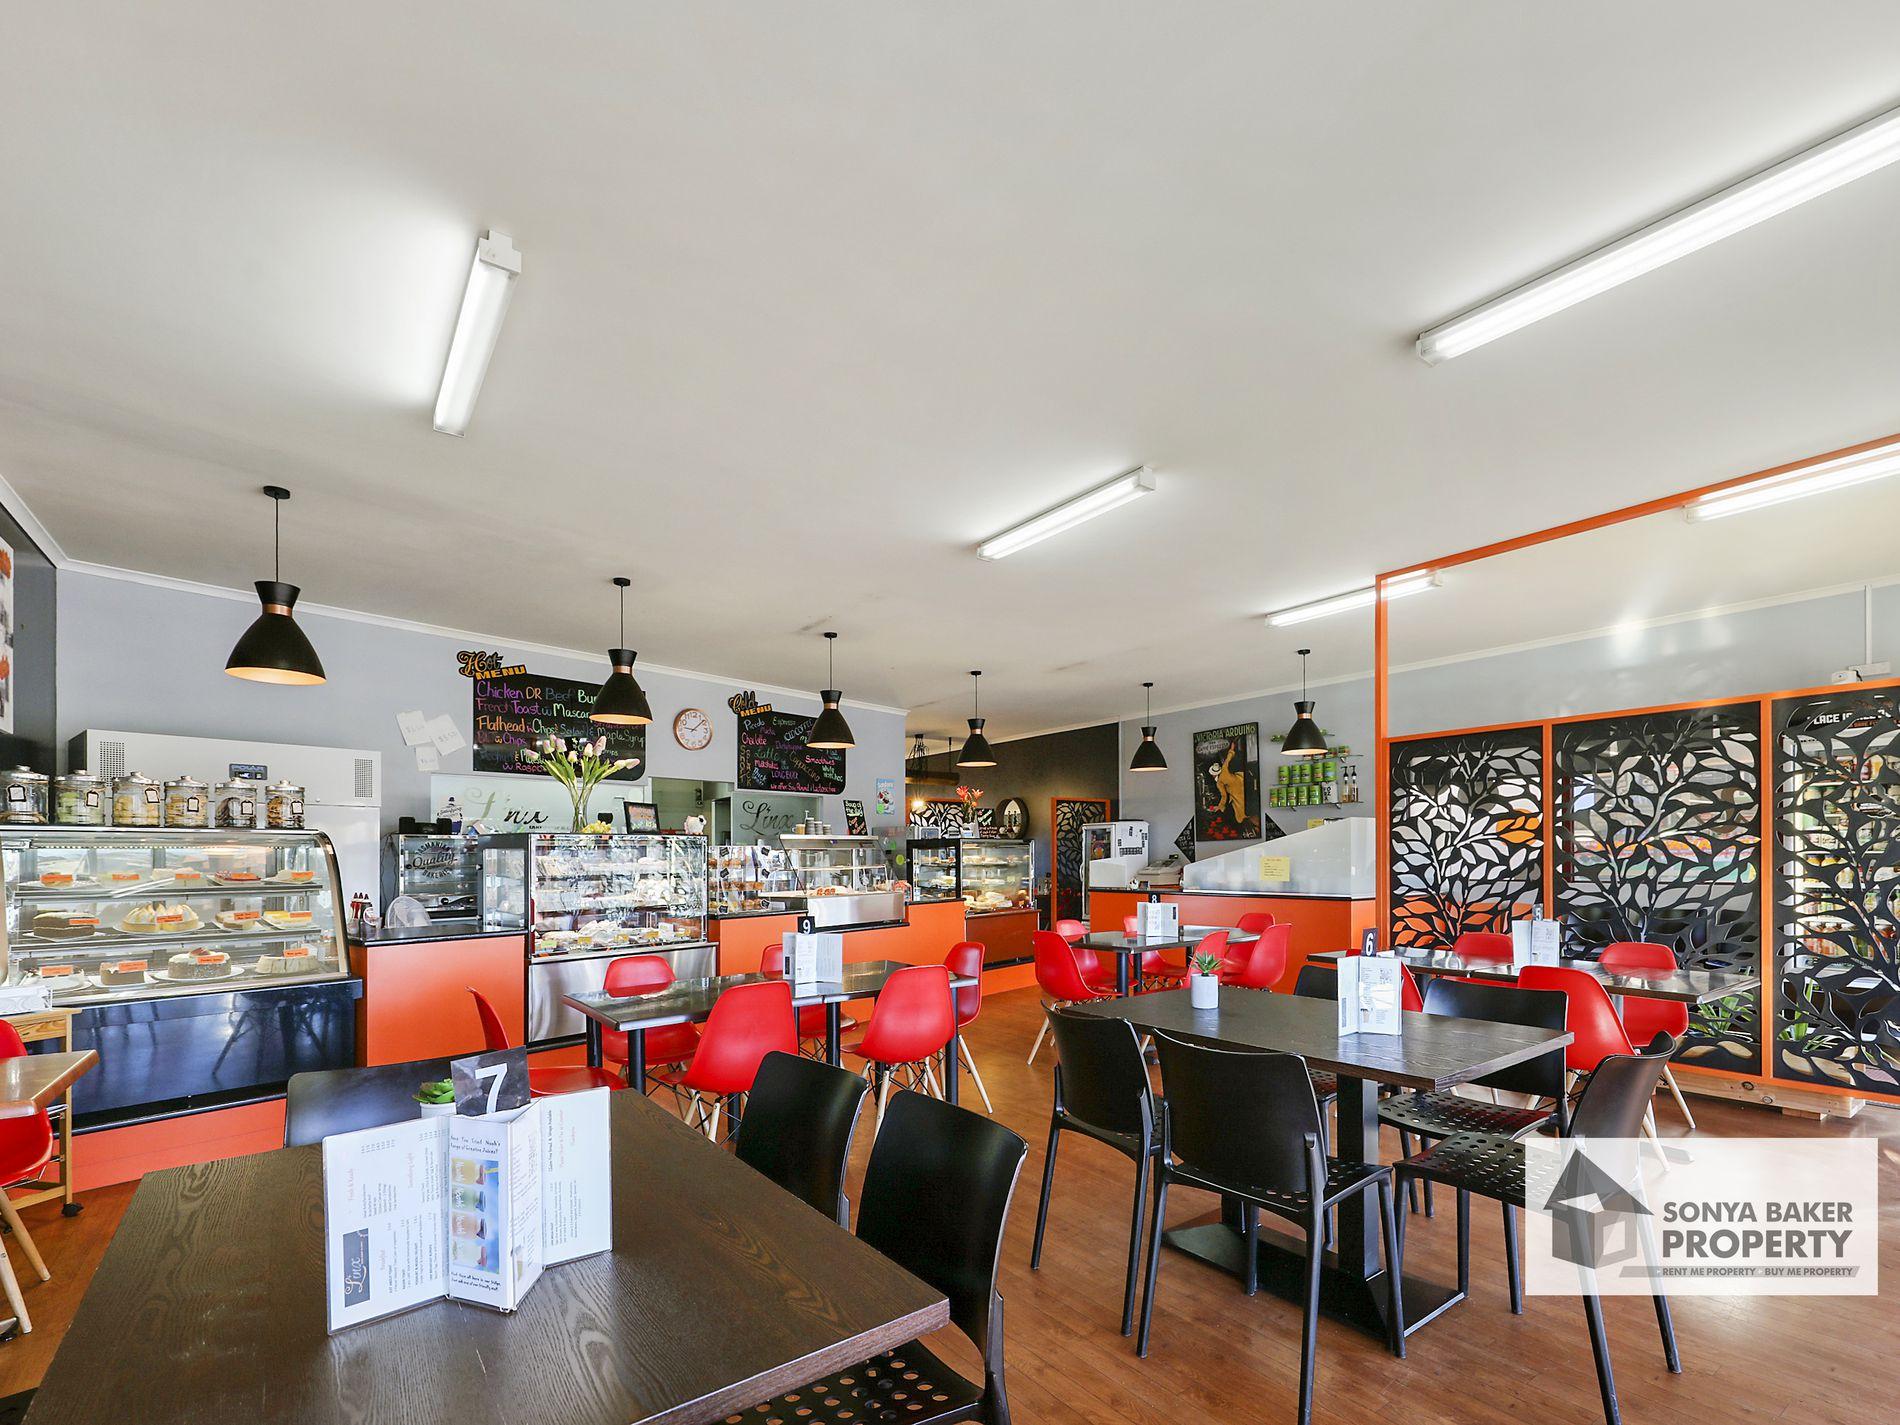 Linx Takeaway & Cafe